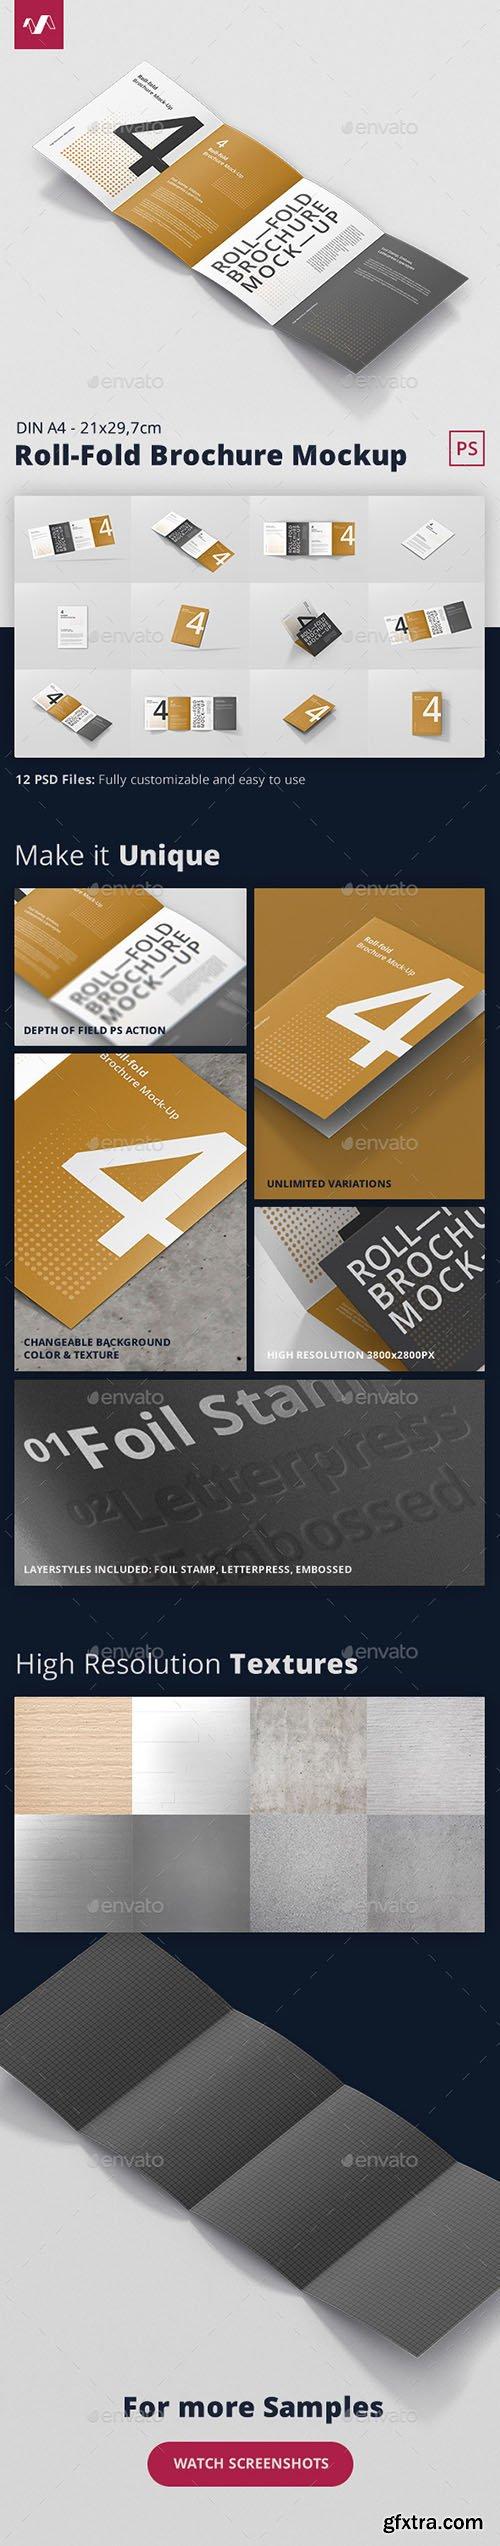 Roll-Fold Brochure Mockup - Din A4 A5 A6 22260474